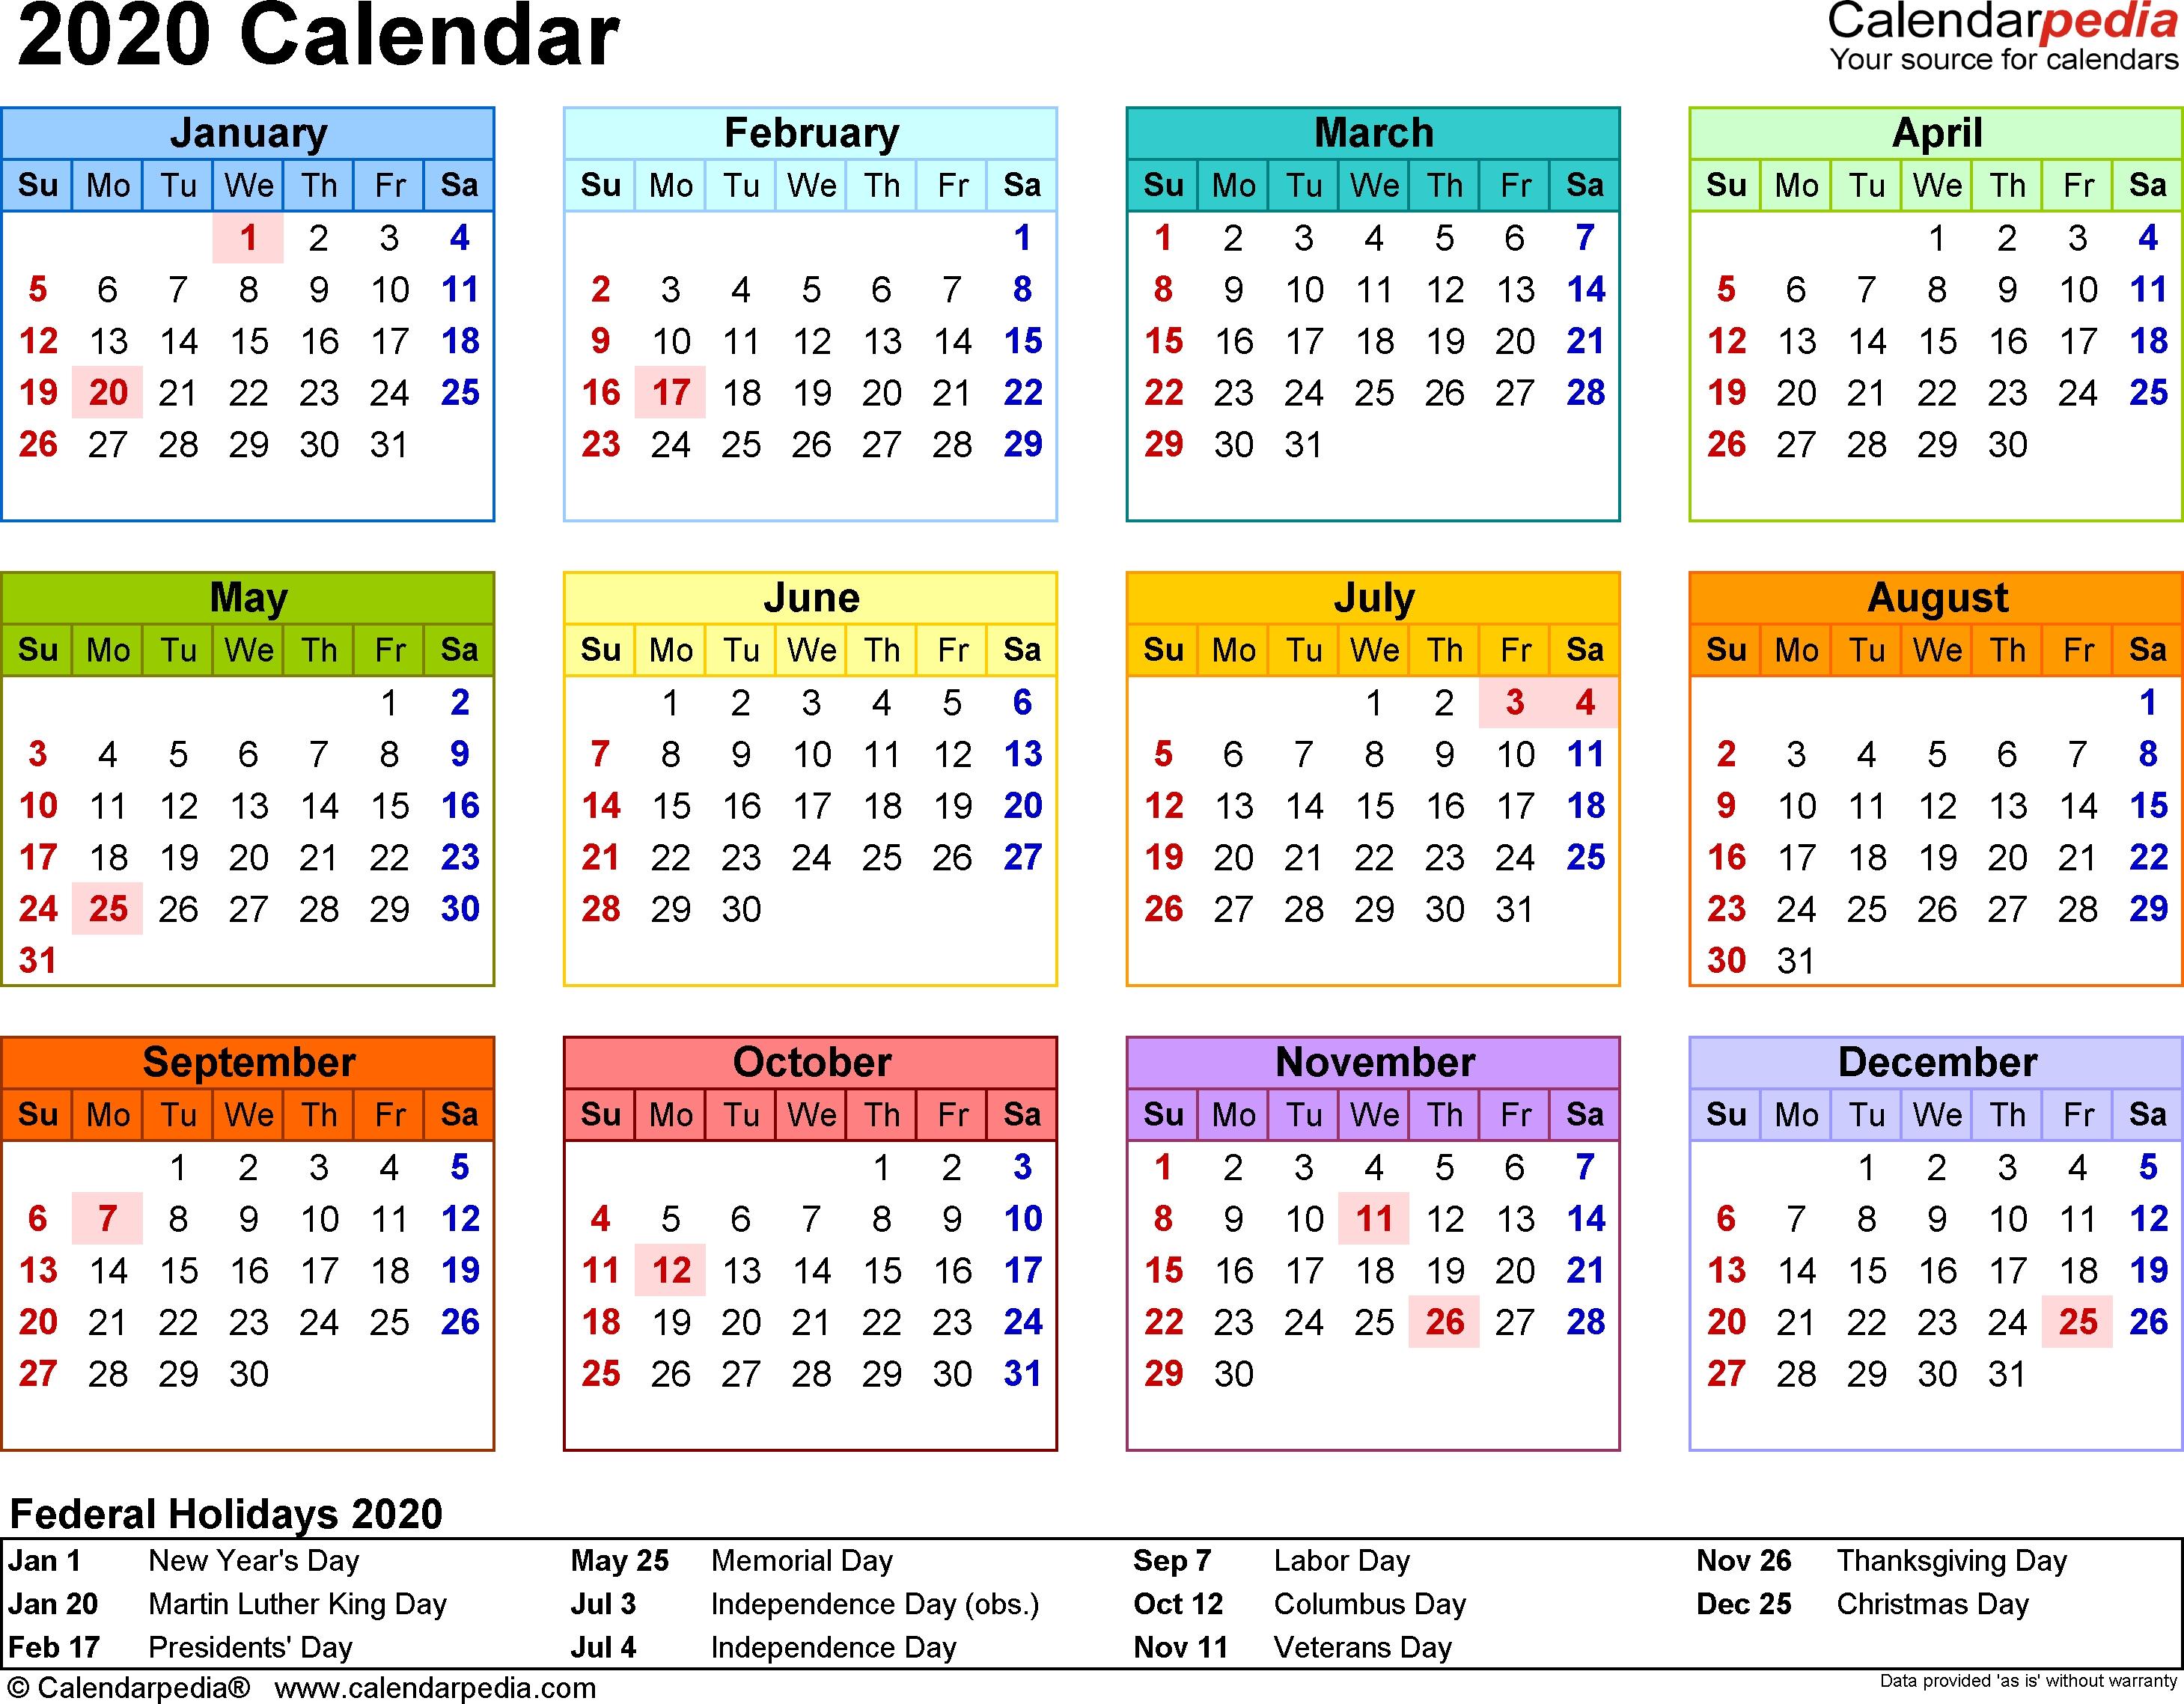 2020 Calendar - 17 Free Printable Word Calendar Templates_School Calendar Nz 2020